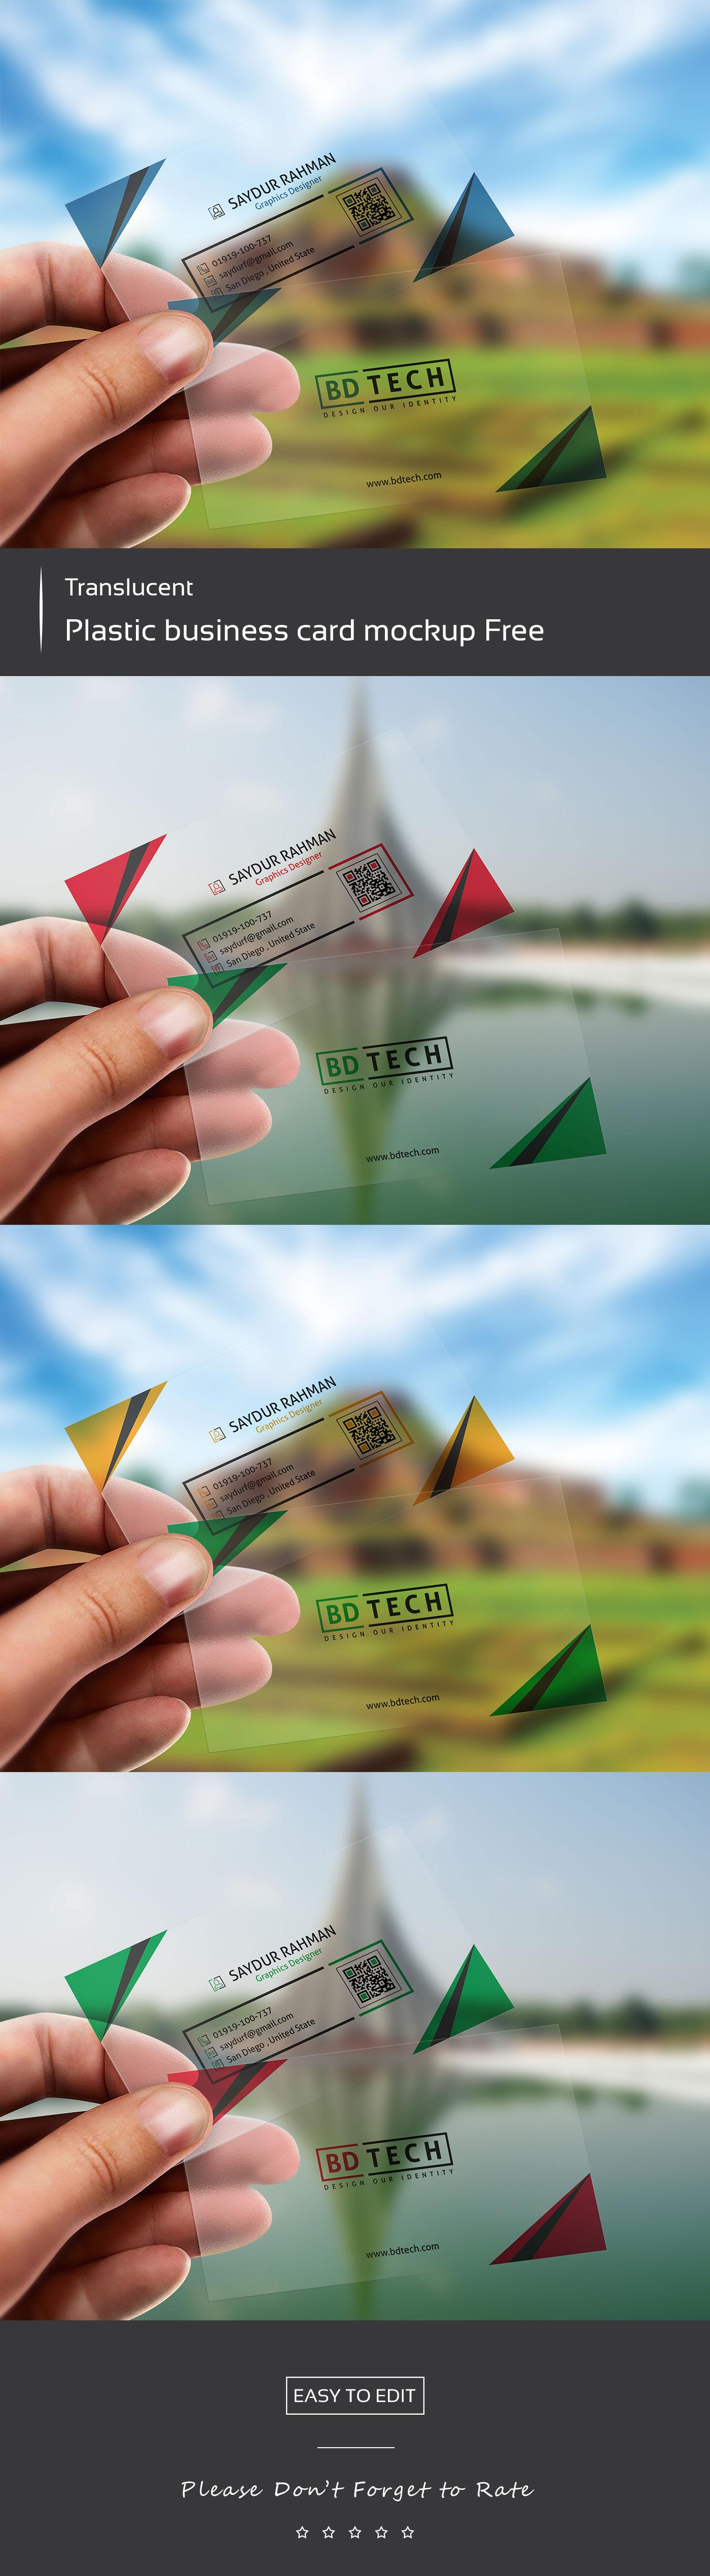 translucent plastic business card mockup free on behance